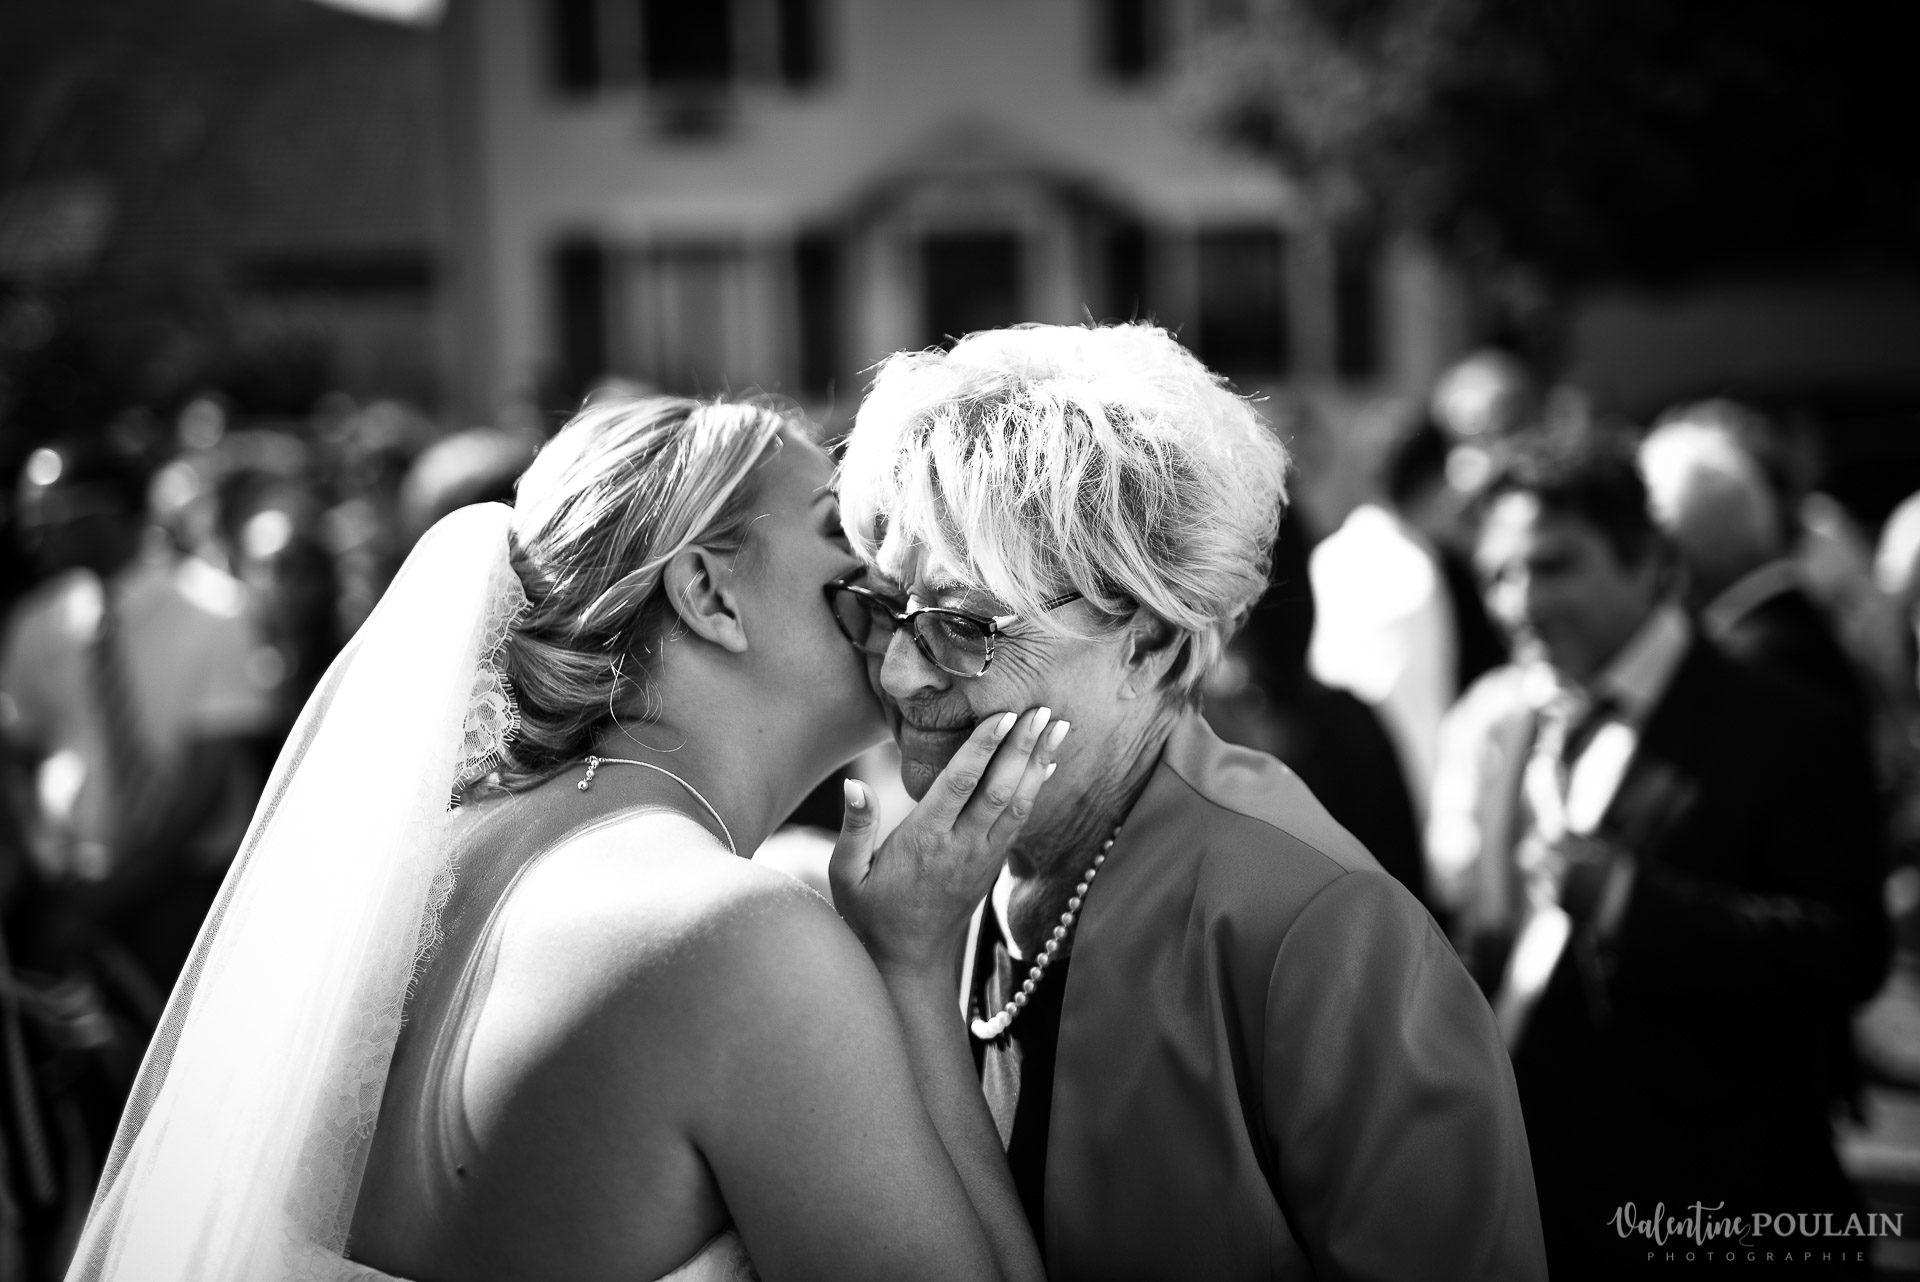 Mariage fun Petit Wettolsheim - Valentine Poulain maman